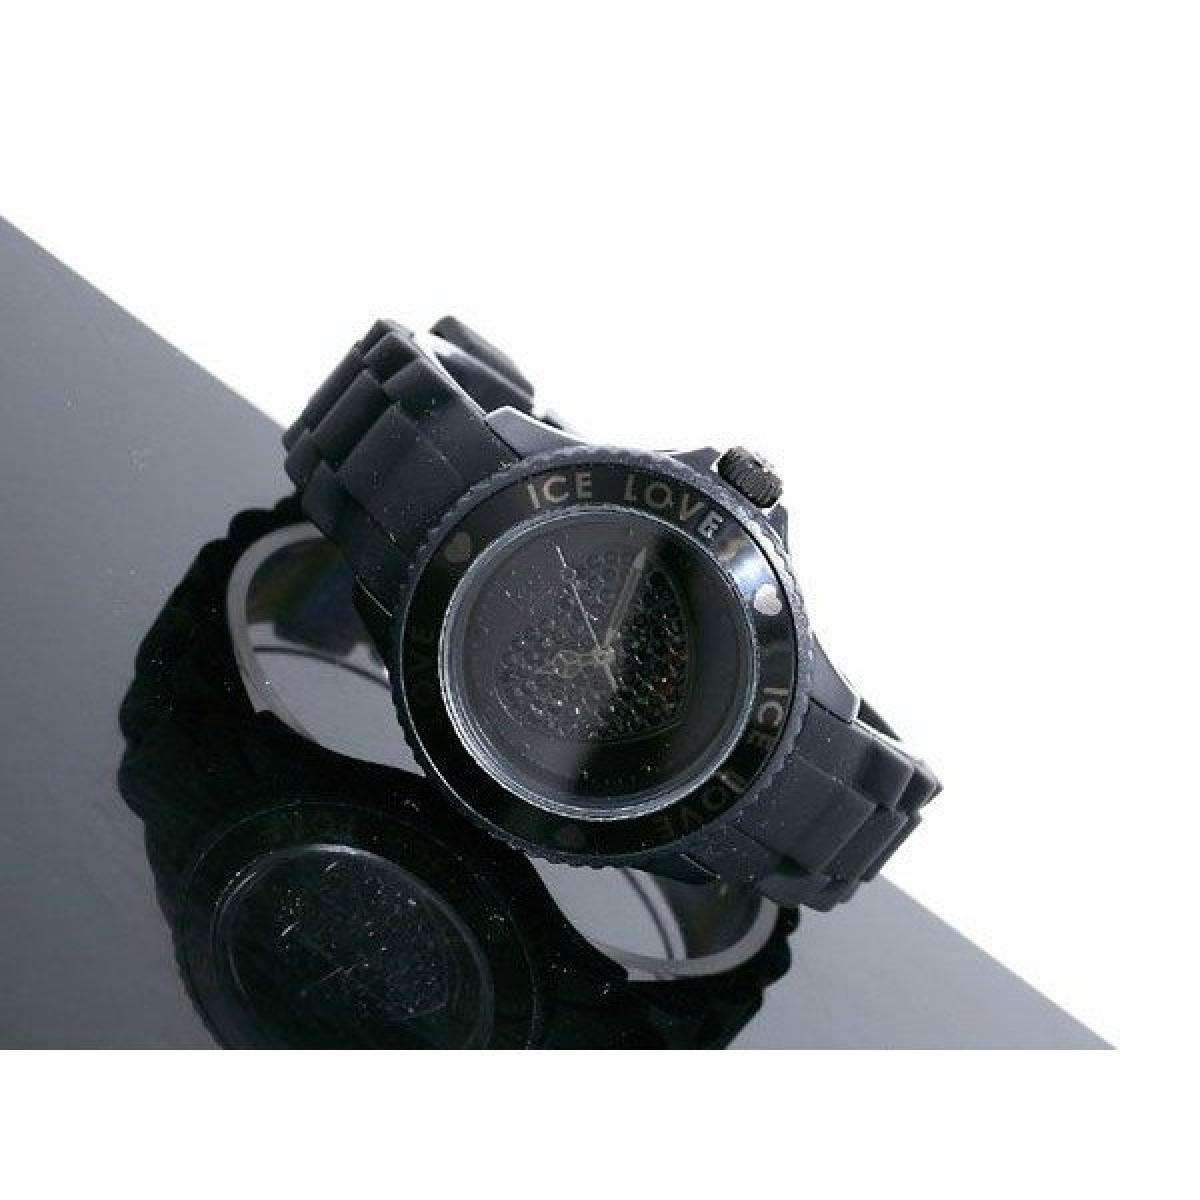 Часовник Ice-Watch LO.BK.B.S.11 Big